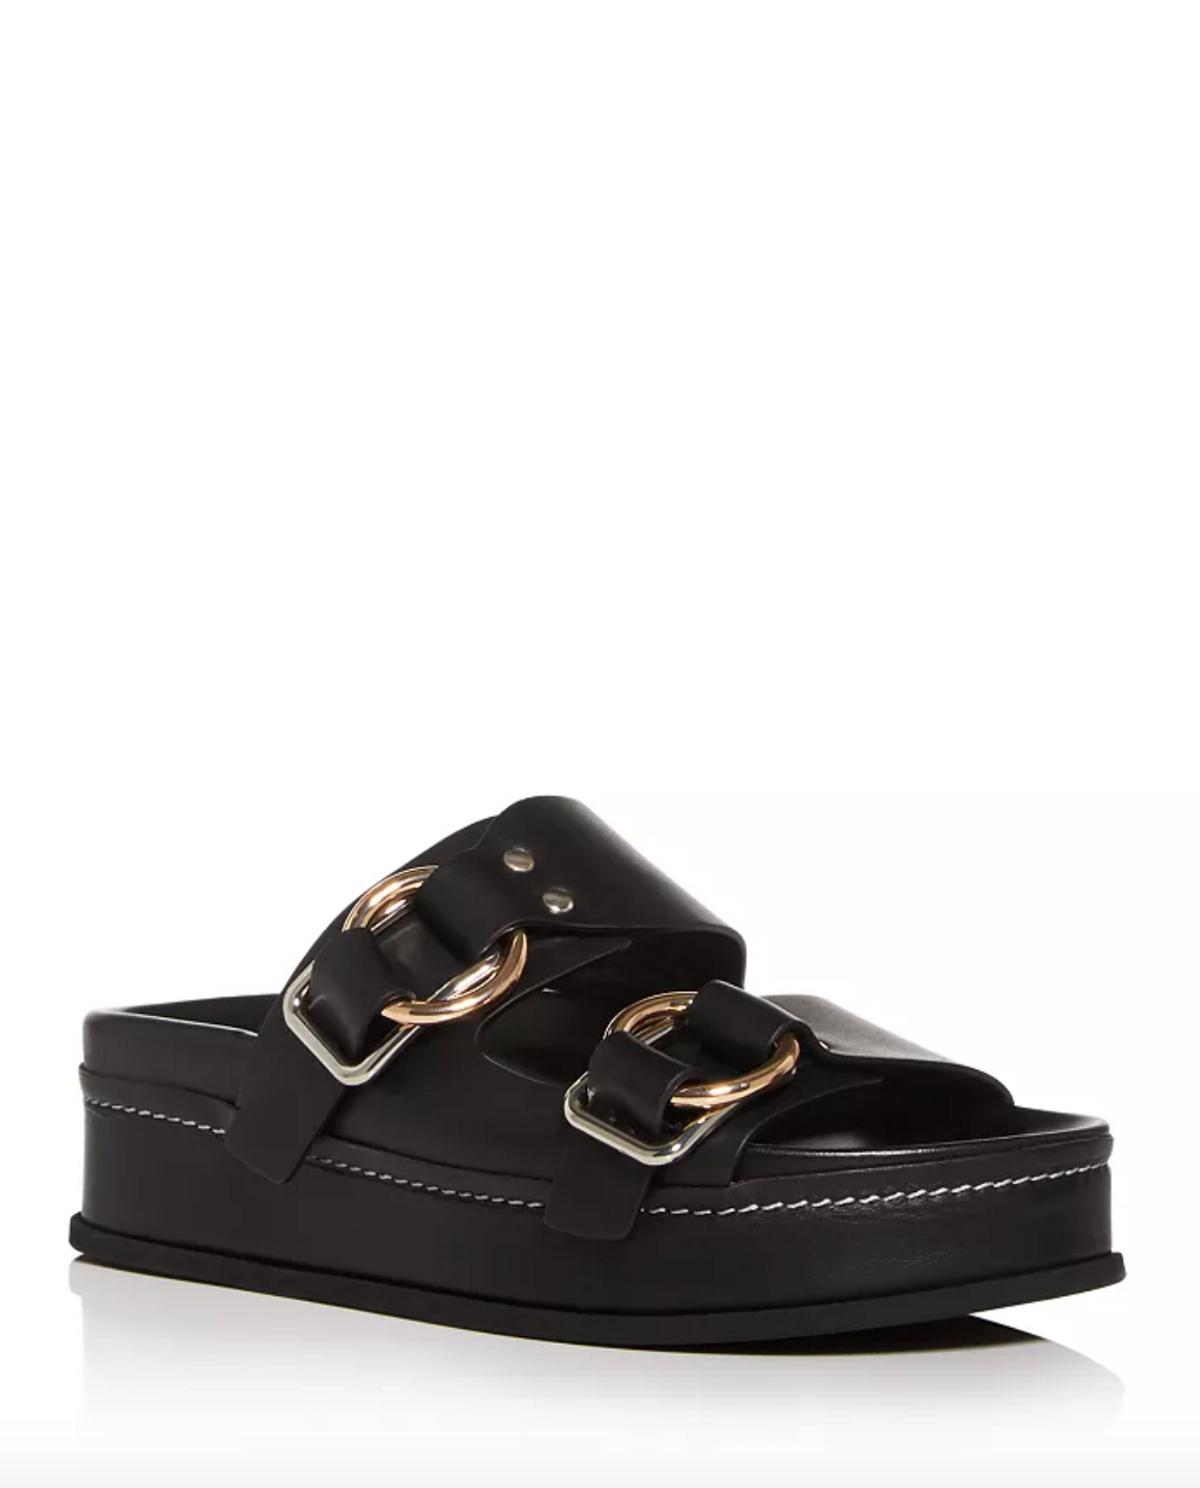 Freida Platform Slide Sandals